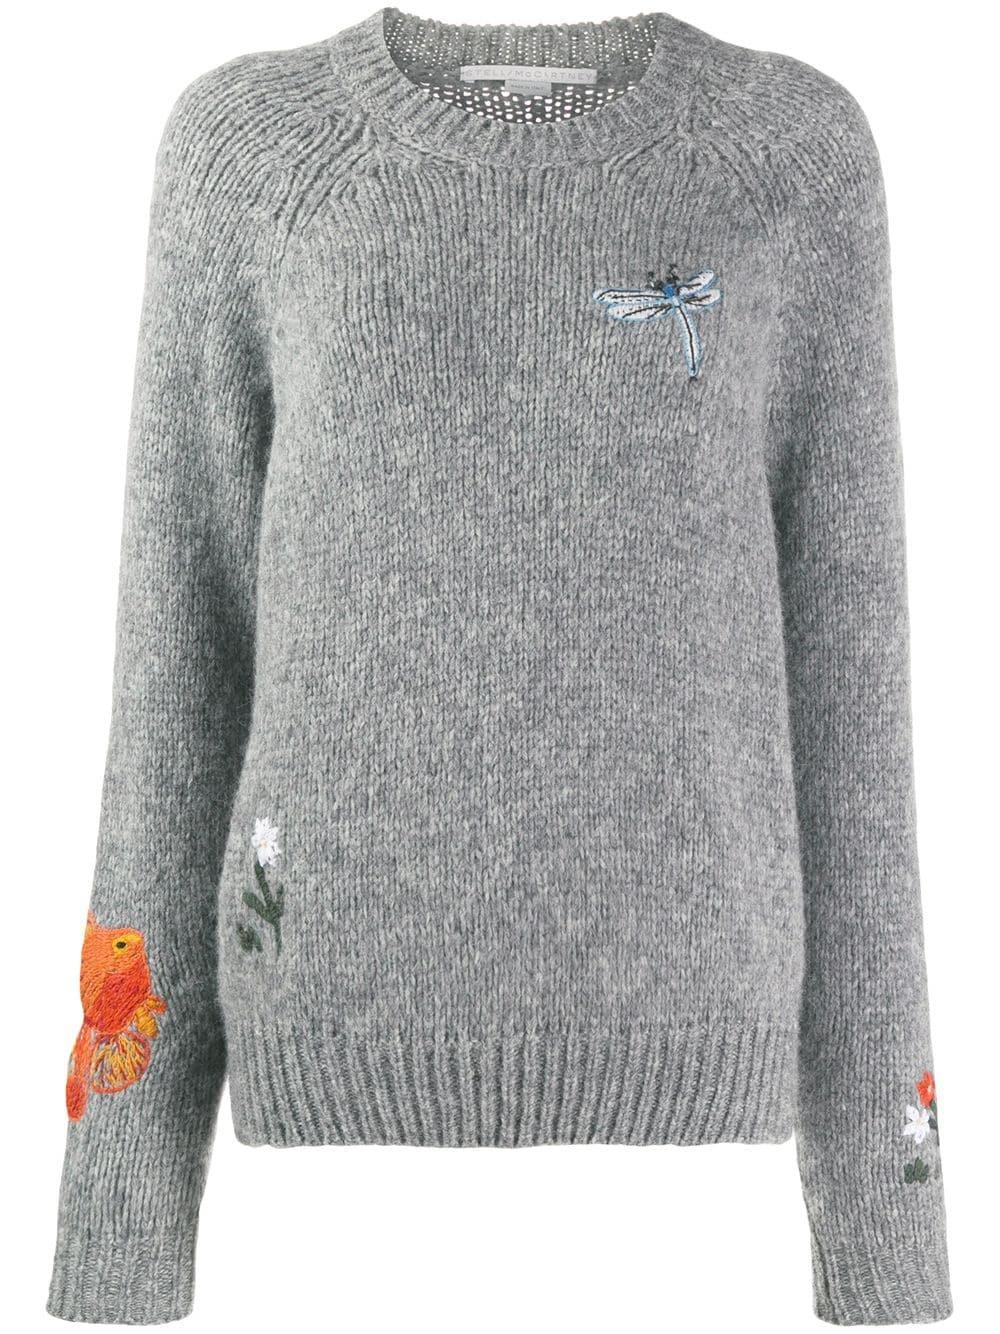 Stella McCartney Animal And Floral Print Motifs Sweater | Farfetch.com